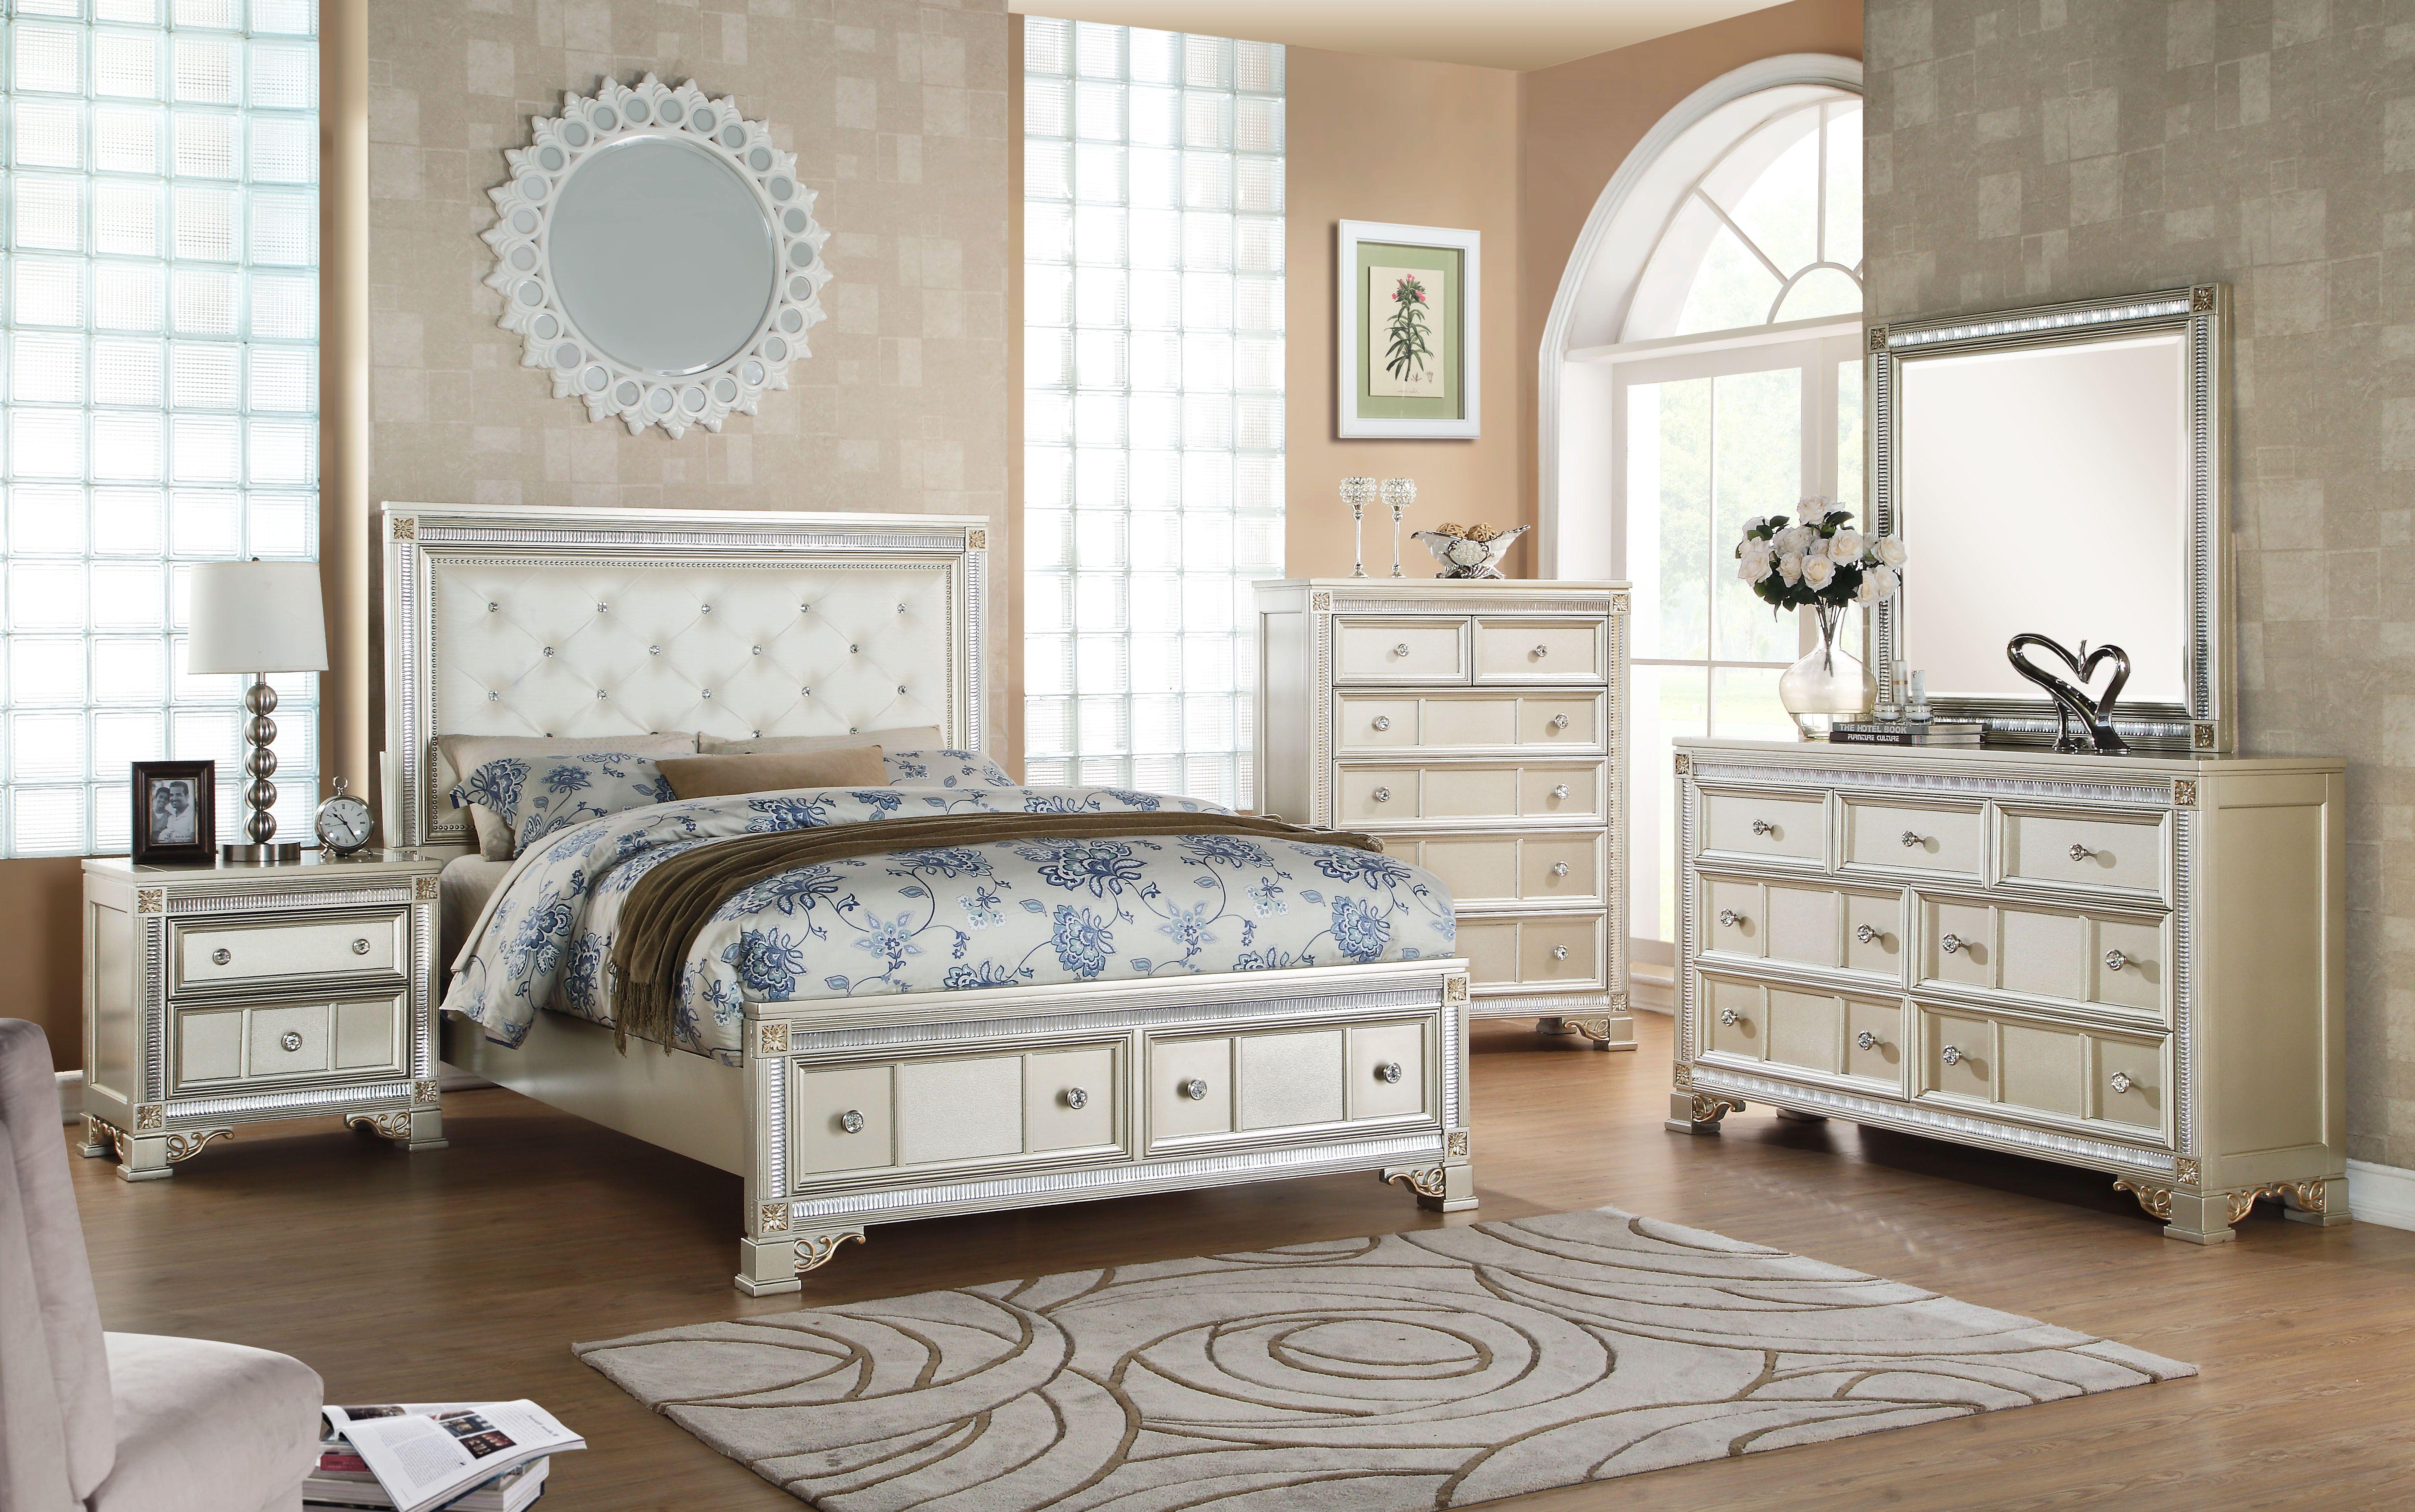 Bedroom Collections | 1600 Tiffany | 1600 Tiffany | Fairfax ...